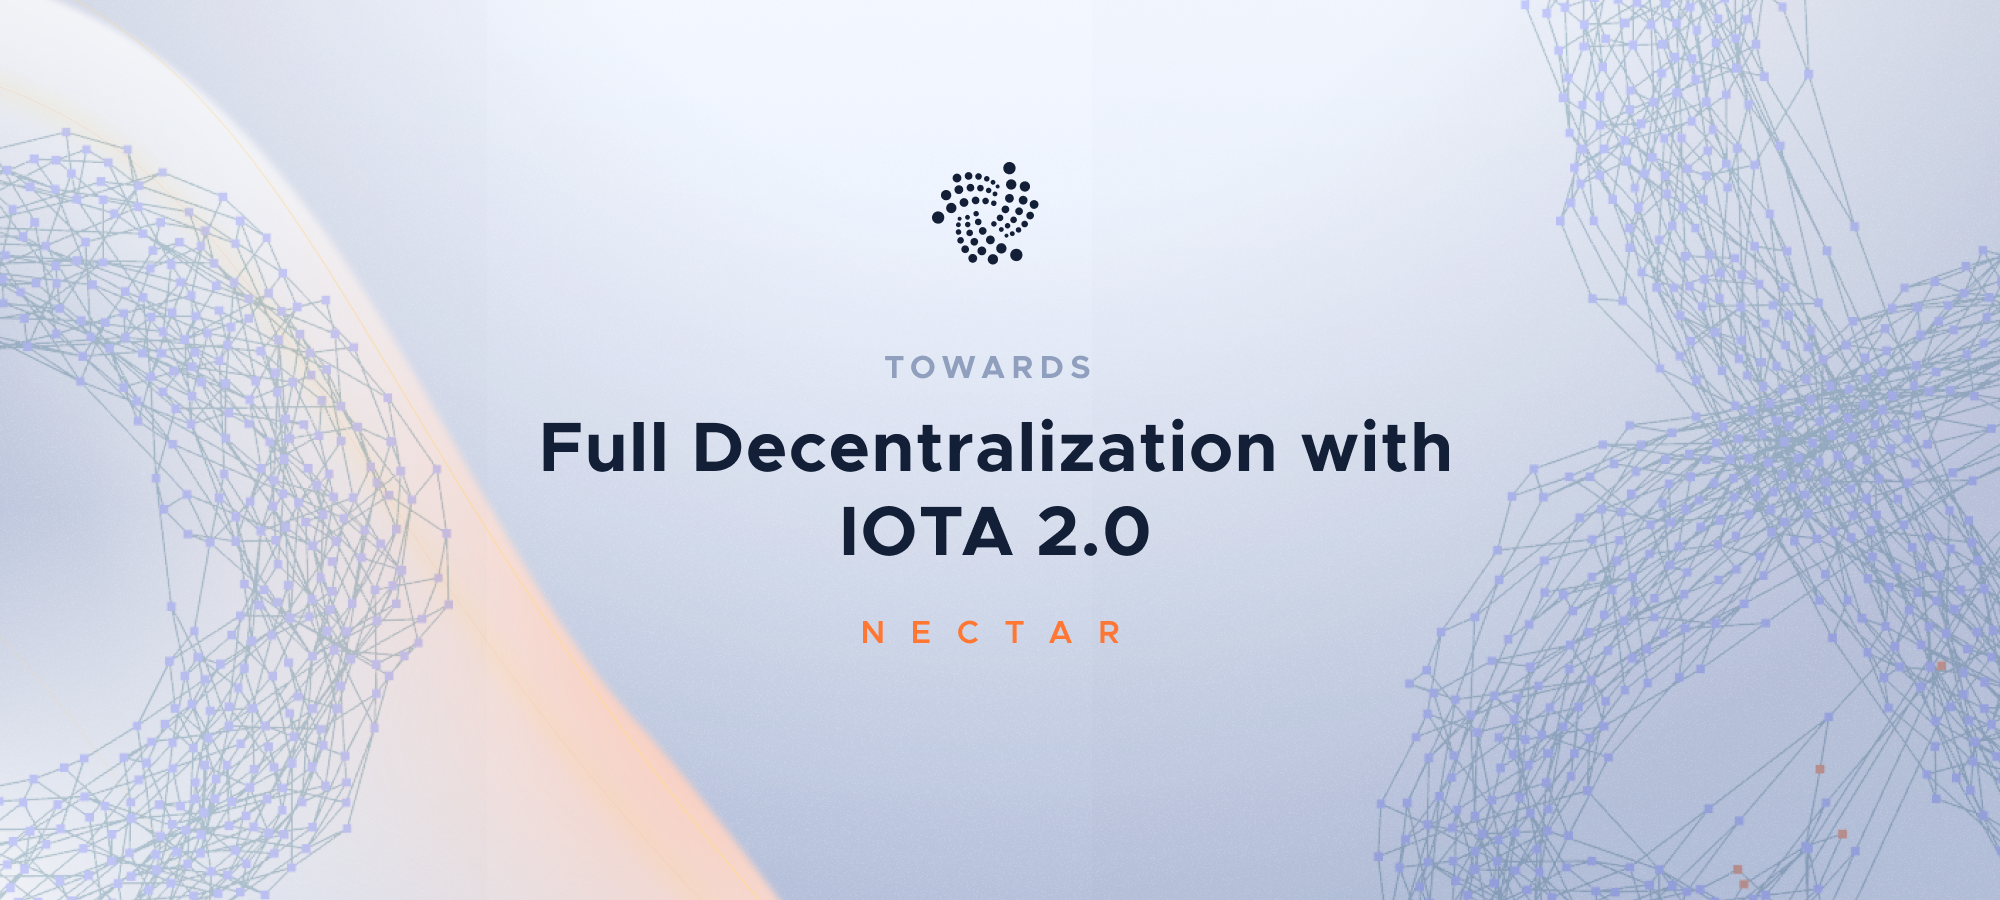 Towards Full Decentralization with IOTA 2.0